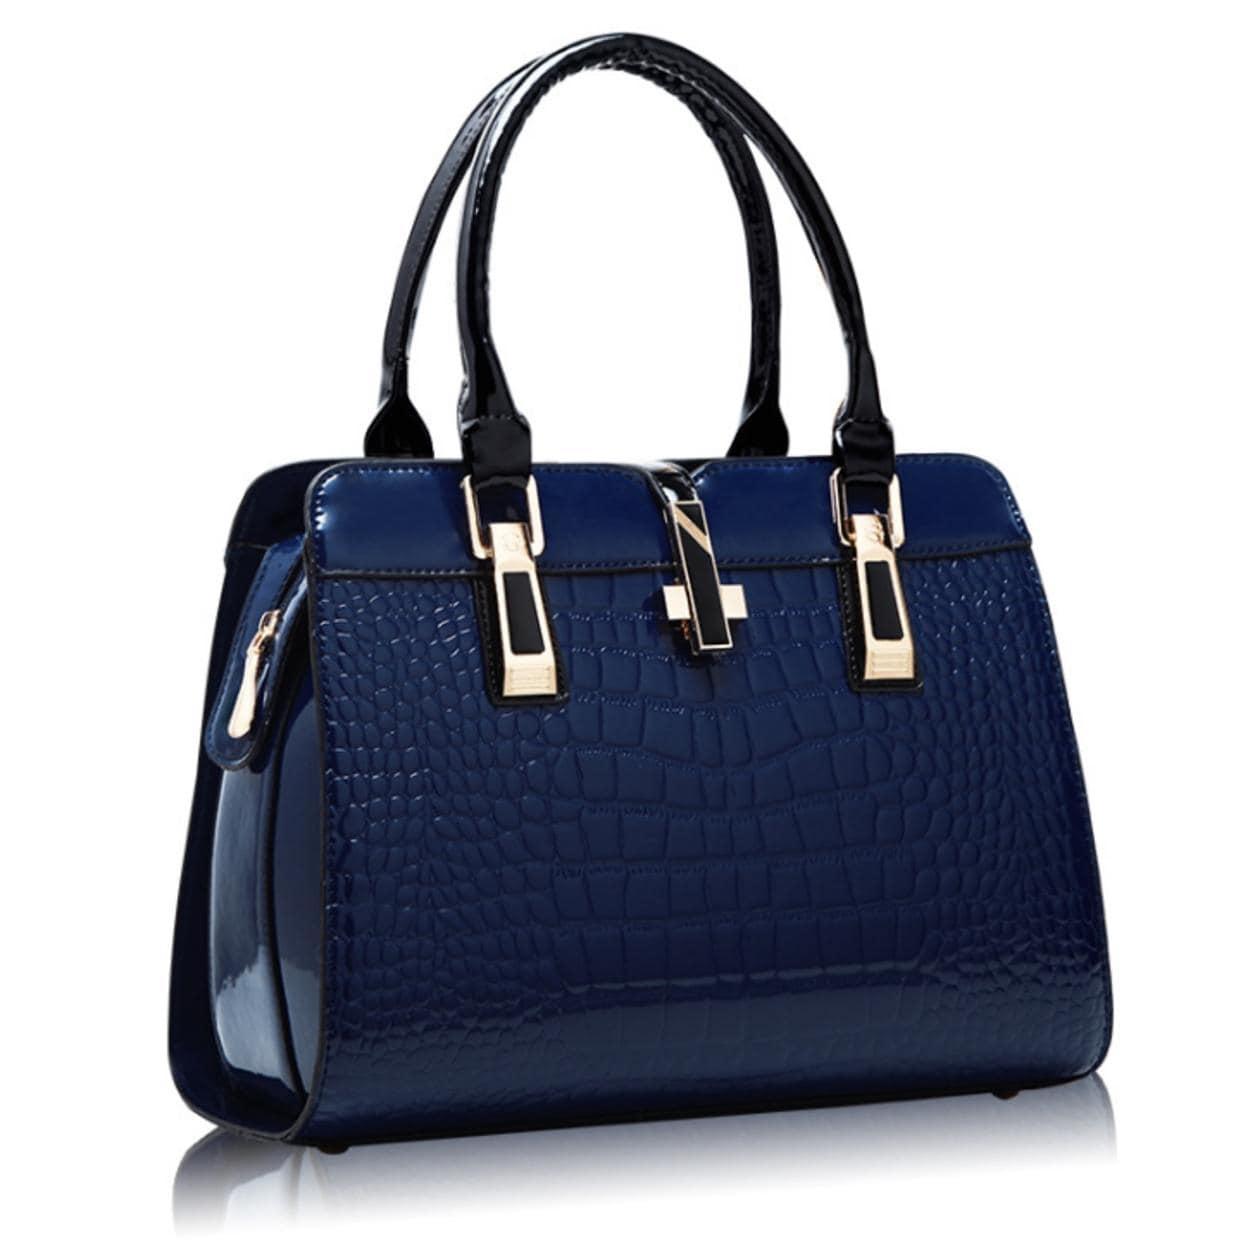 Bags Women Cowhide Handbag Bag Shoulder Vintage Crocodile Free Shipping On Orders Over 45 23490156